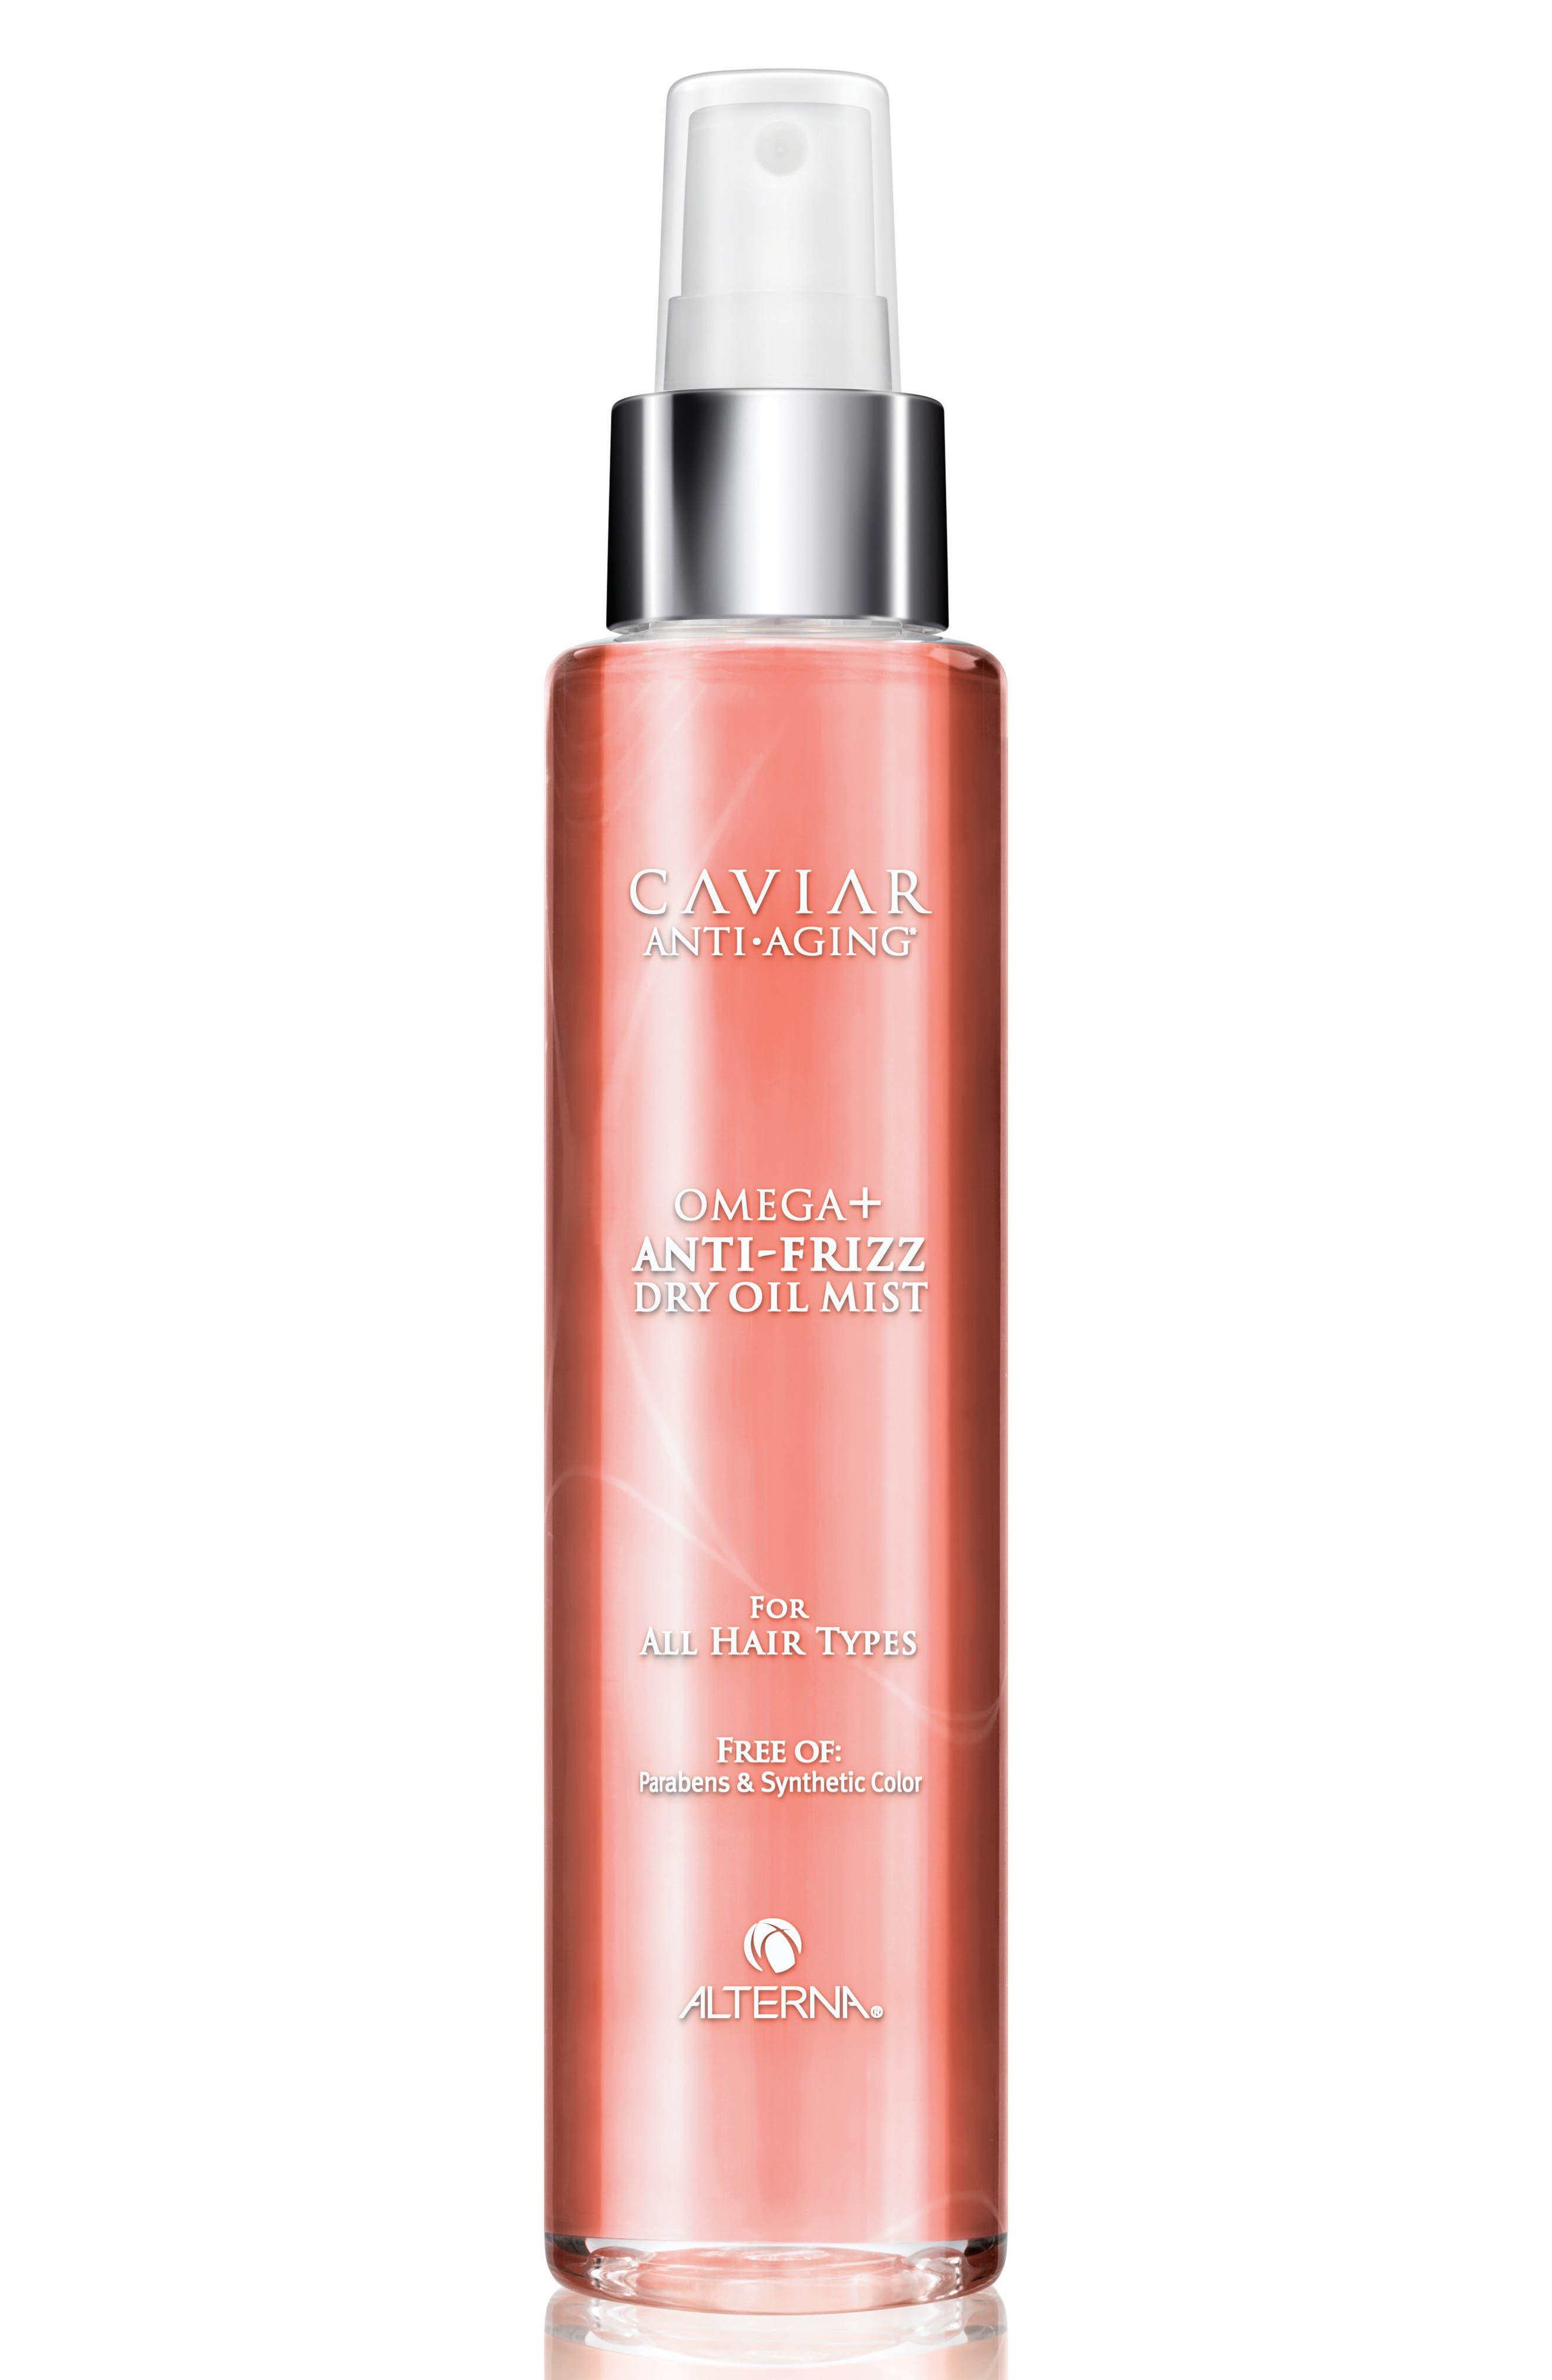 Main Image - ALTERNA® Caviar Anti-Aging Omega Anti-Frizz Dry Oil Mist